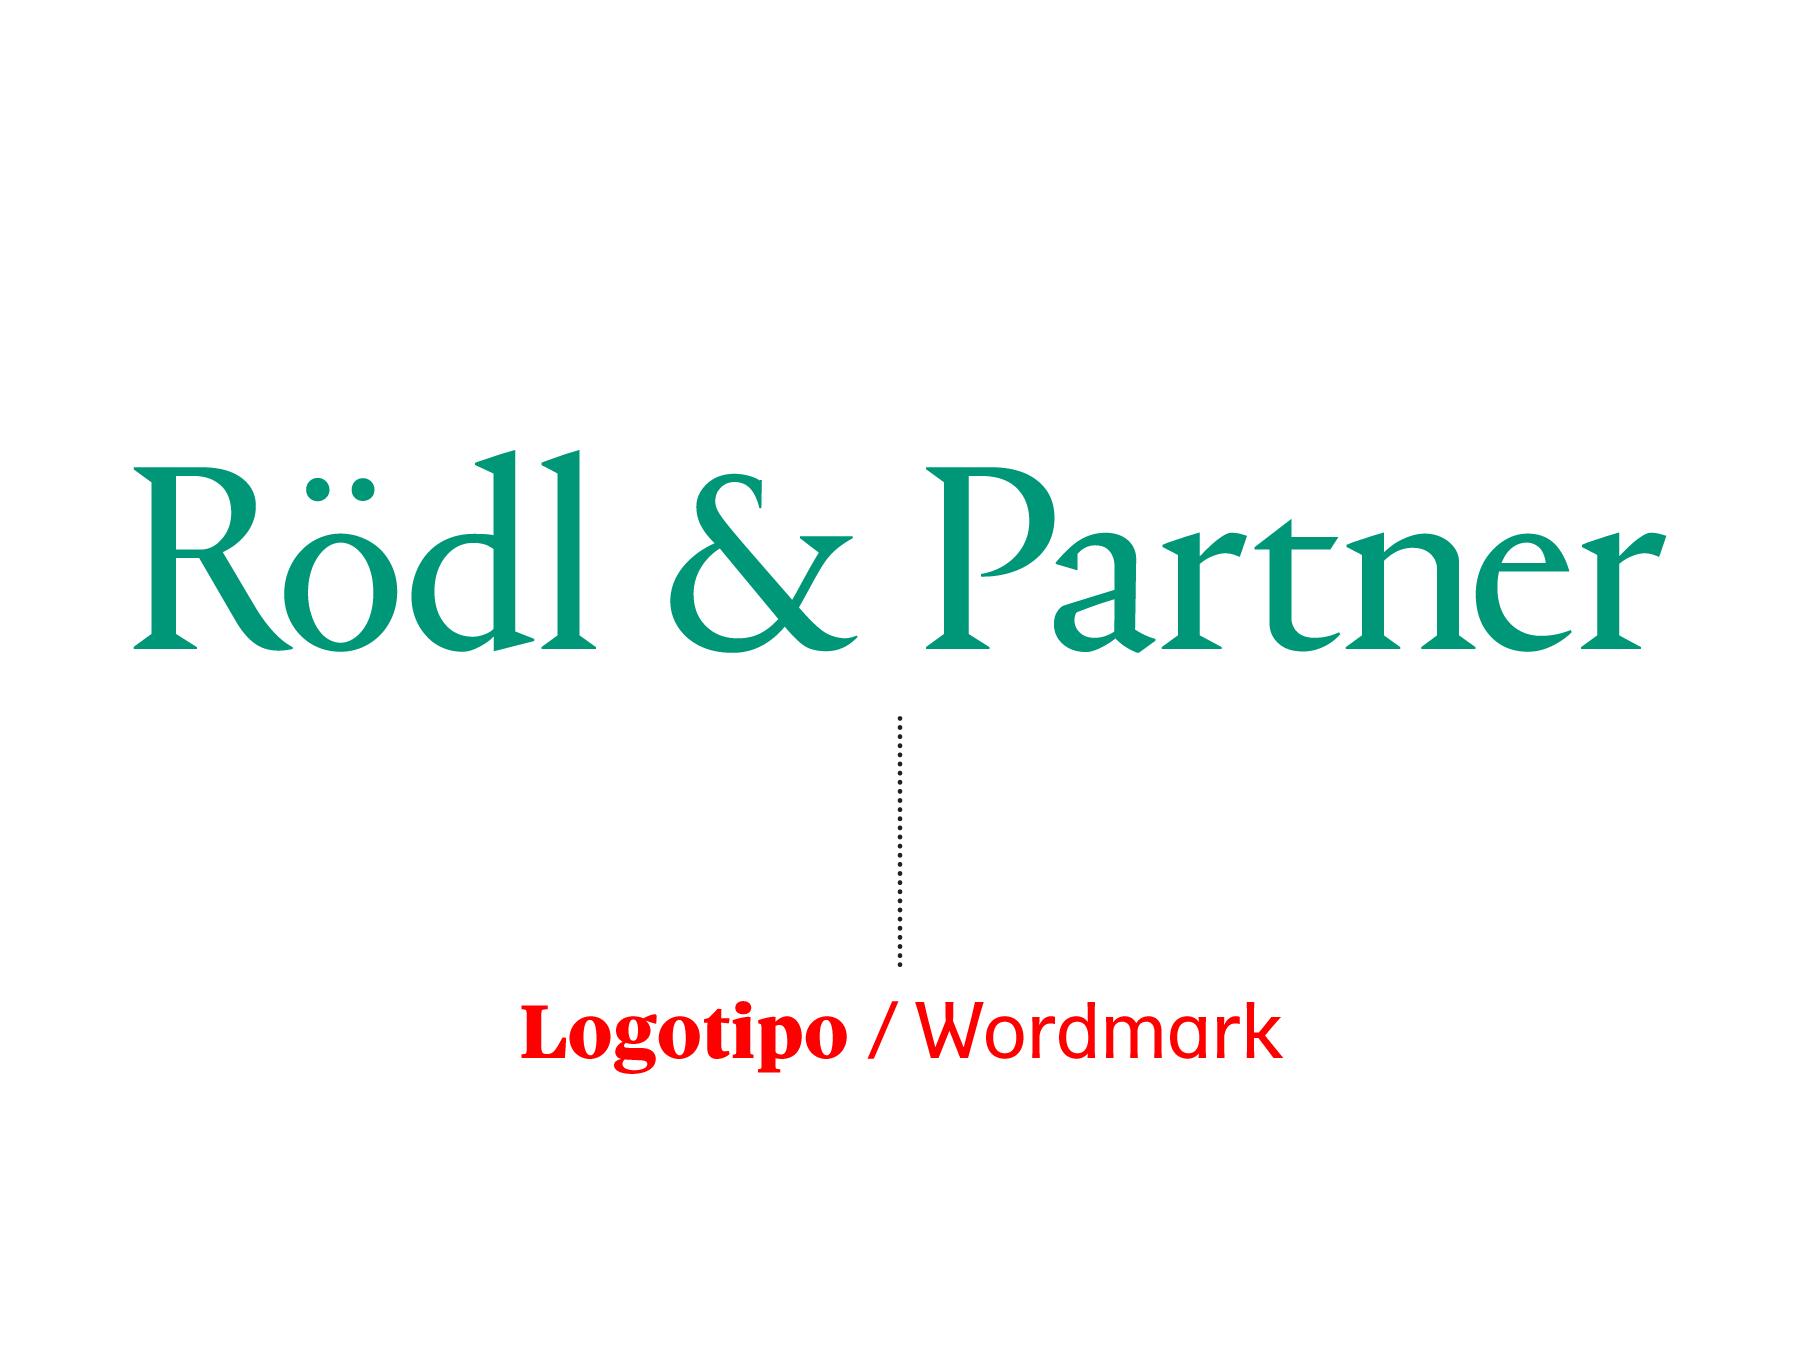 Logotipo o workdmark